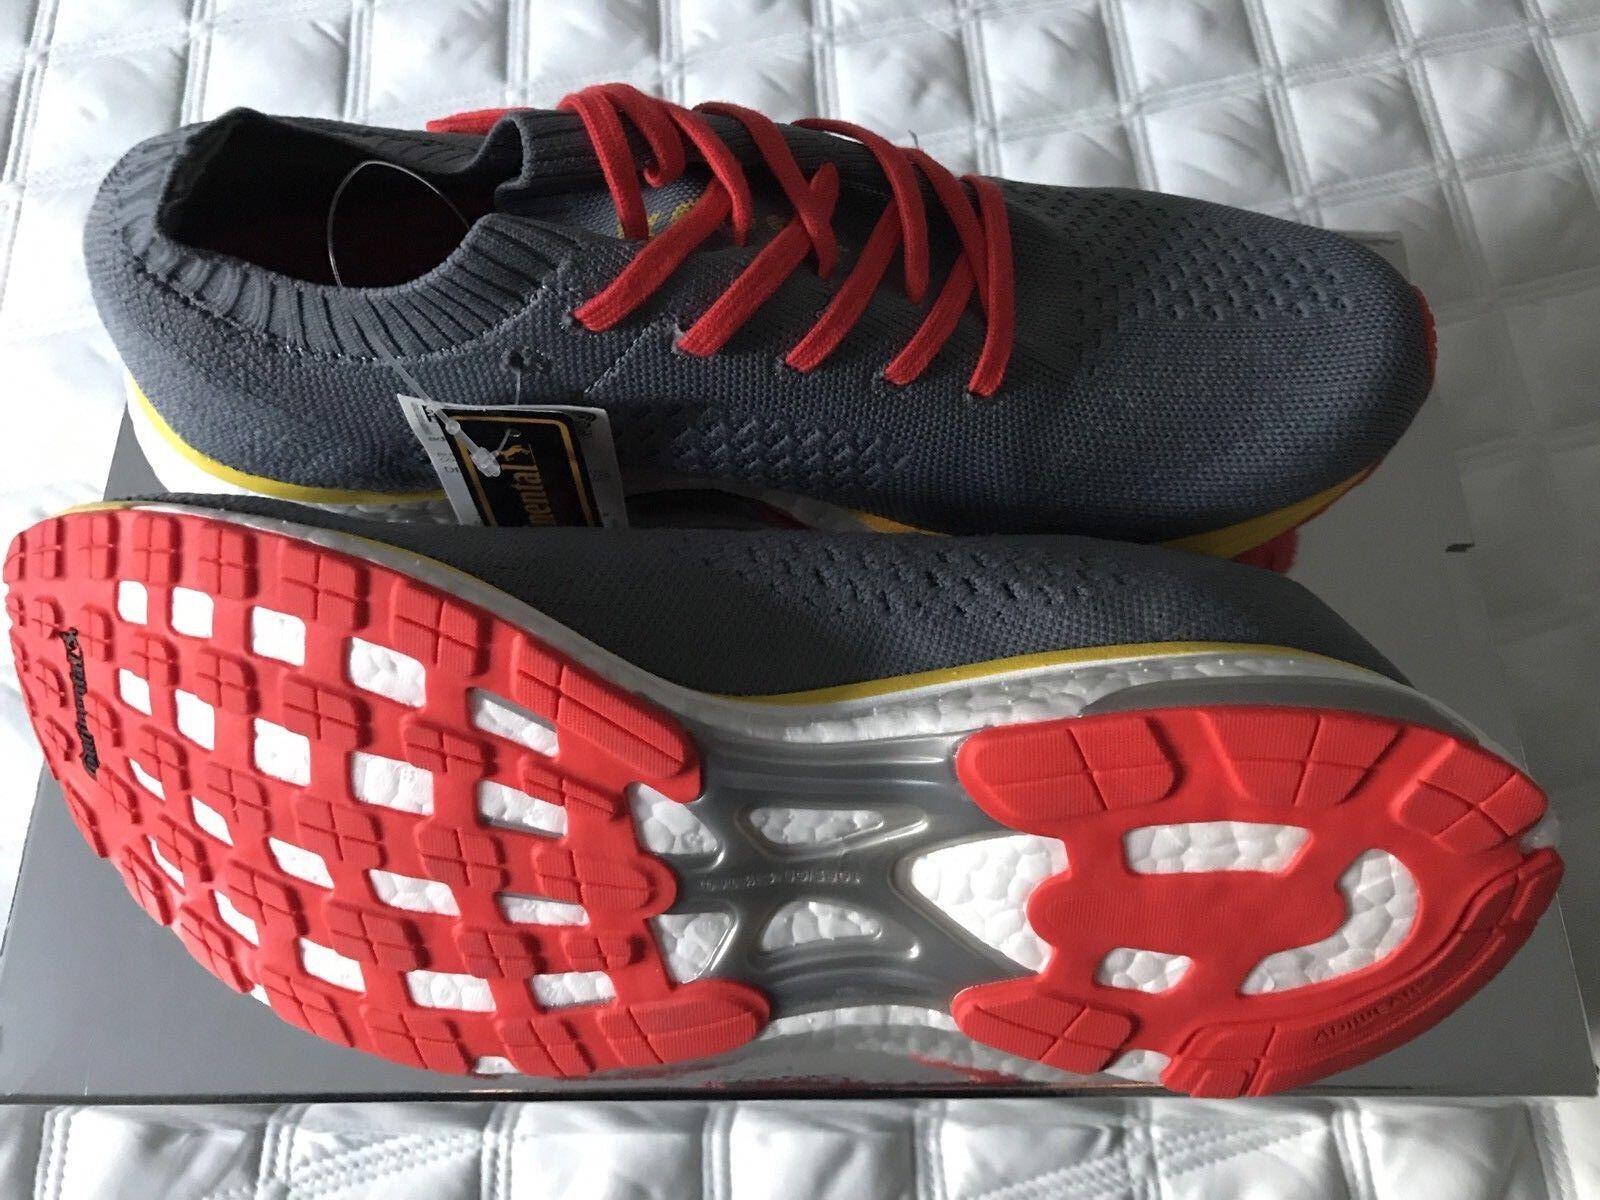 sports shoes 5e165 4eccf Adidas X Kolor AdiZero Prime Boost shoes Grey Mens Size 7.5 DB2545 Brand New